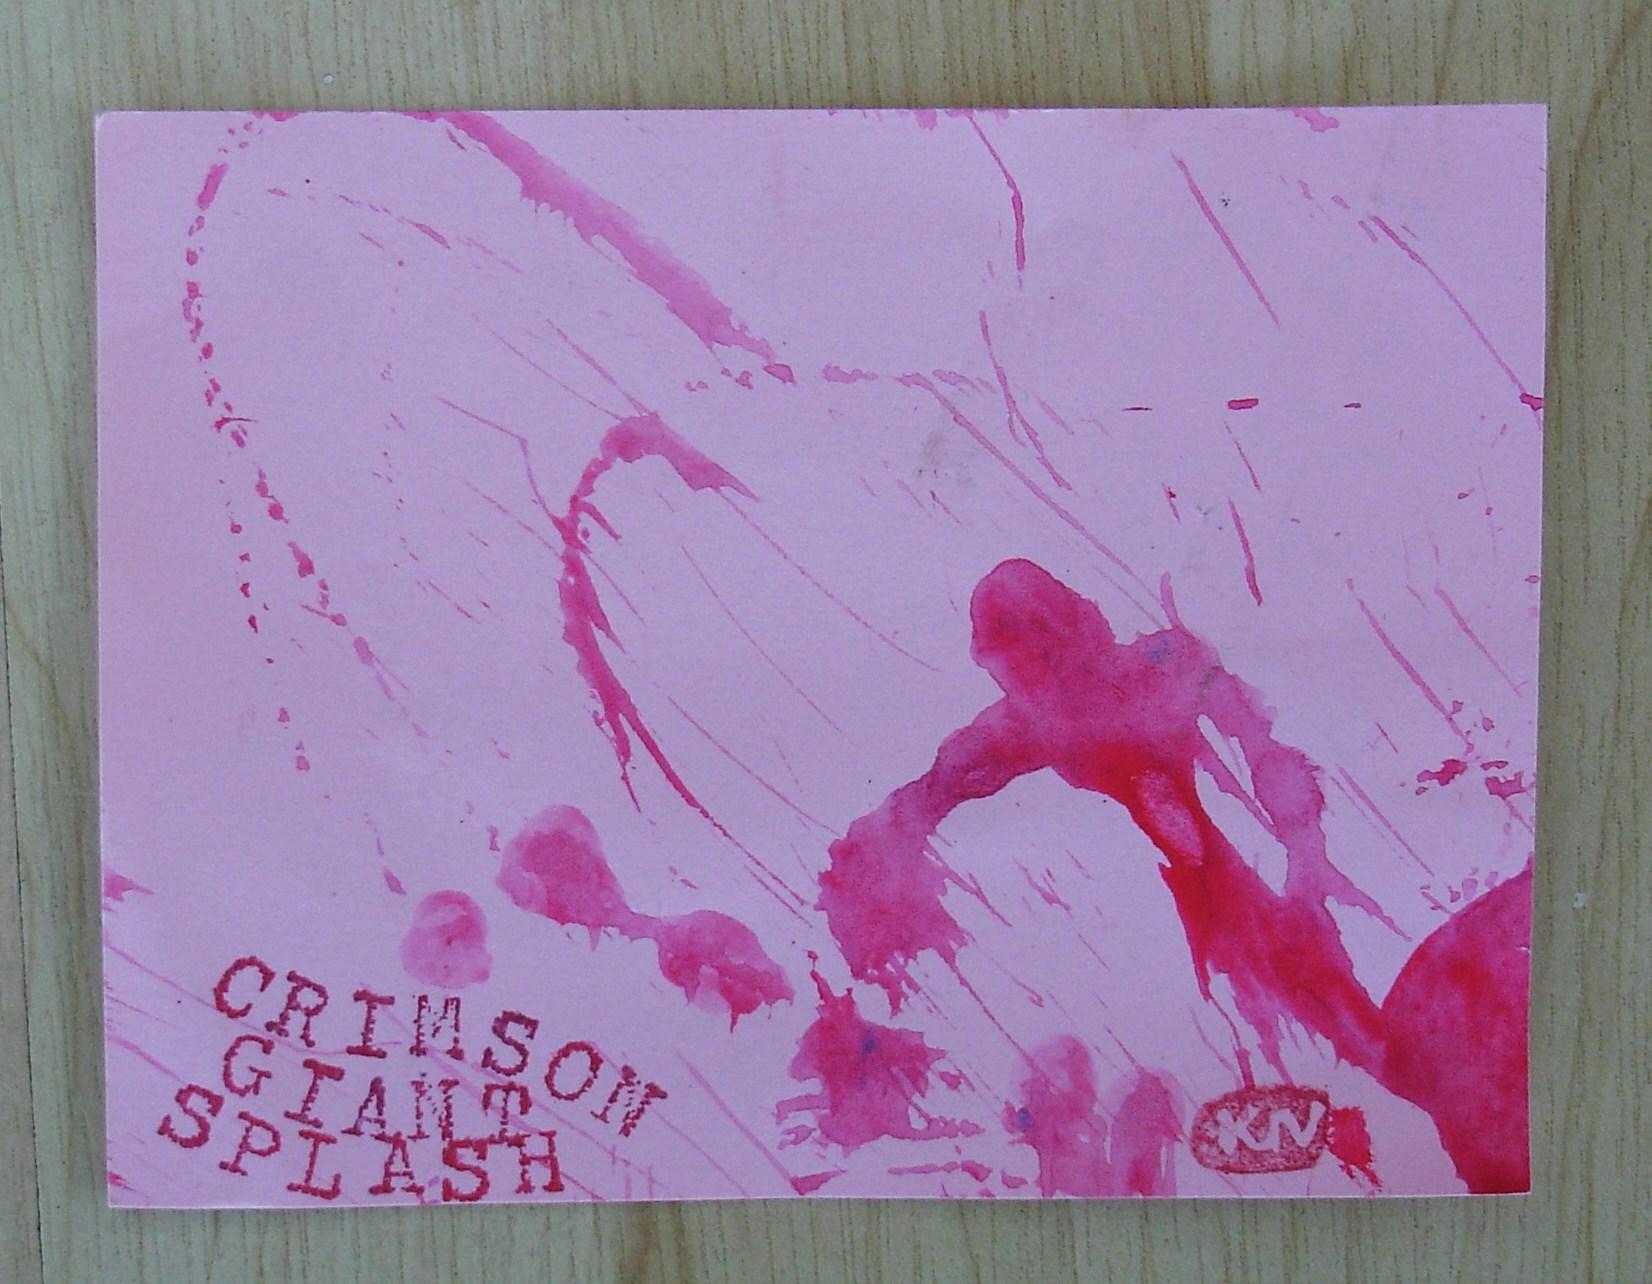 Crimson Giant Splash Katerina N.